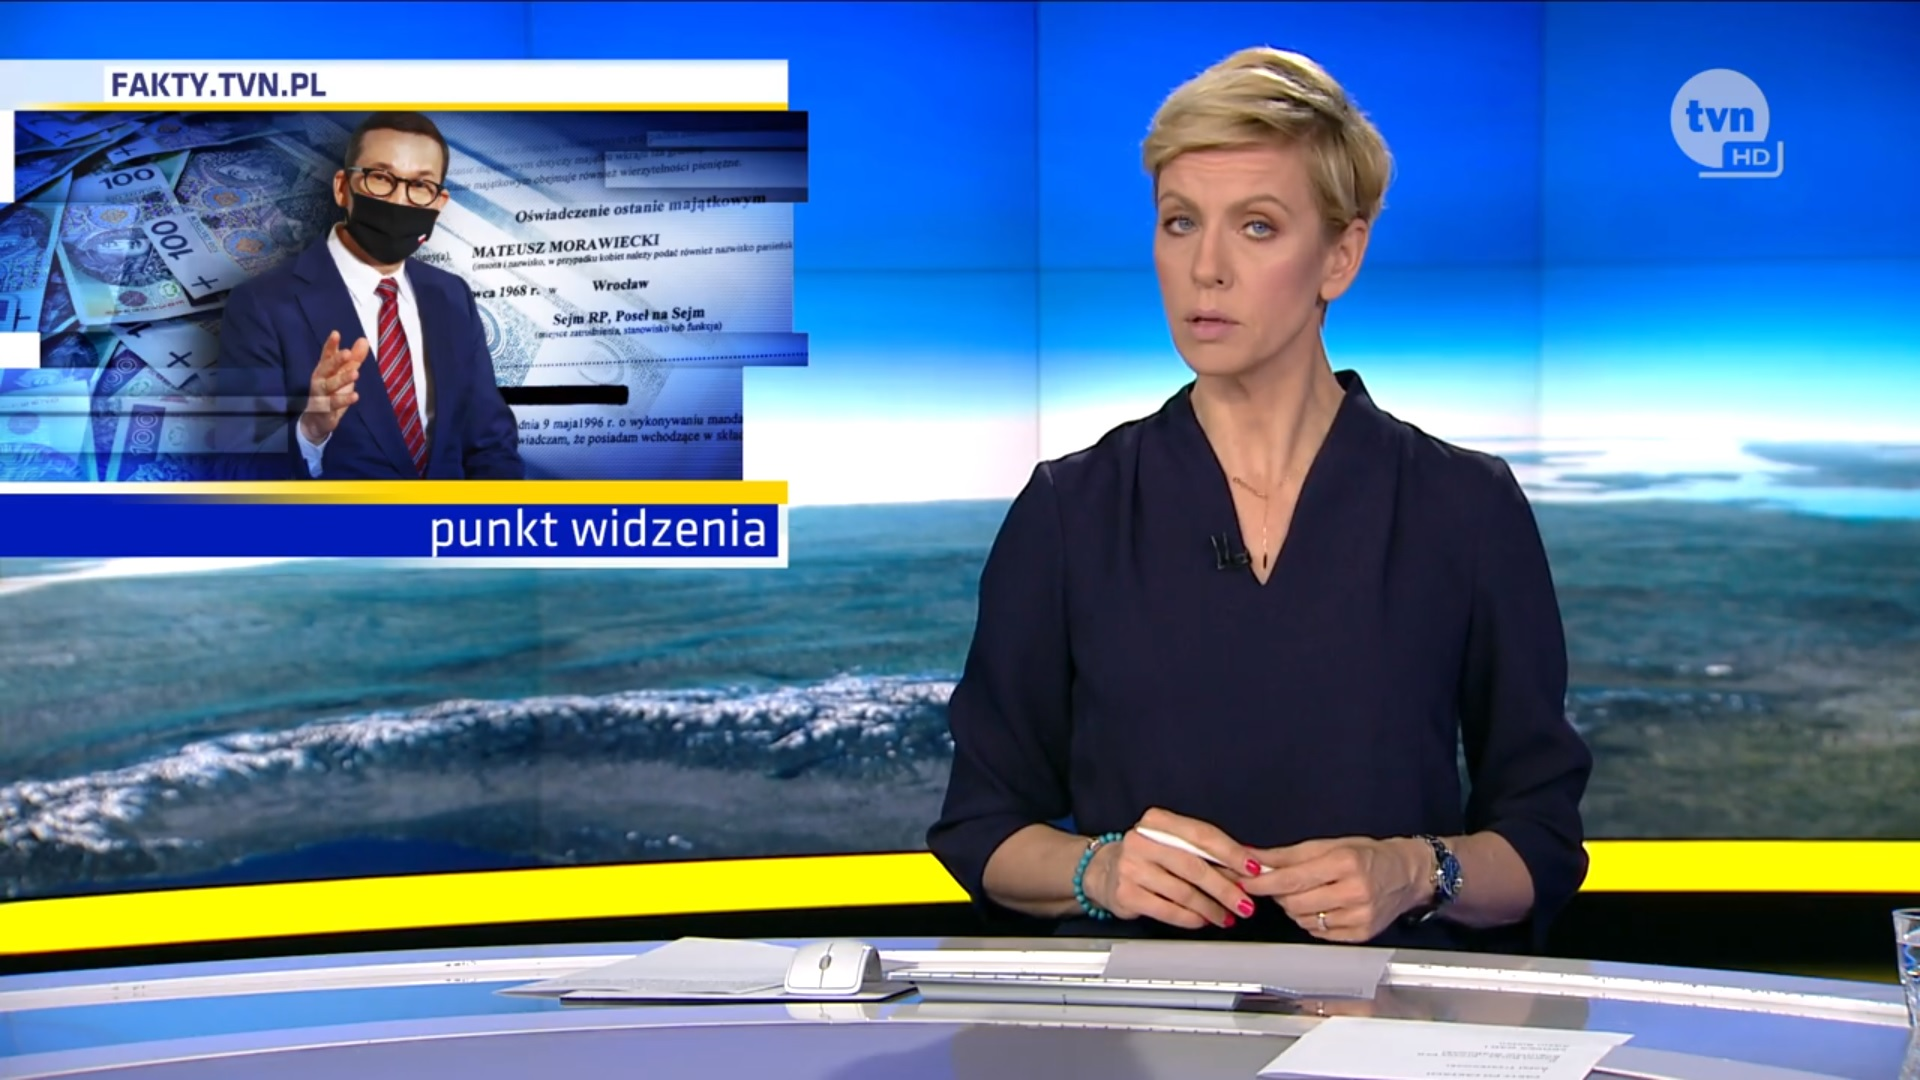 (screen) fakty.tvn24.pl